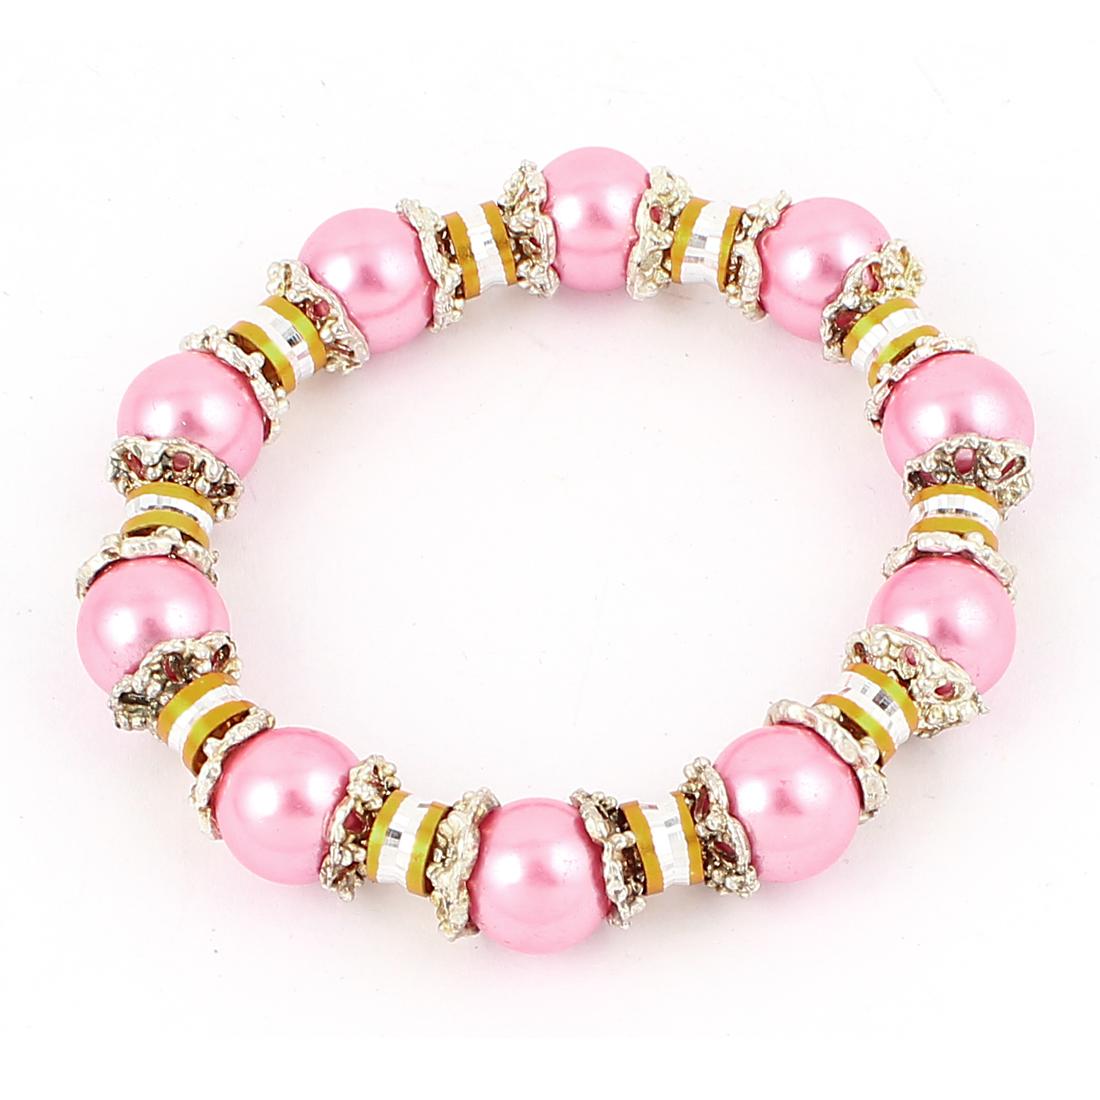 Lady Jewelry Faux Imitation Pearls Beads Decor Elastic Wrist Bangle Bracelet Pink